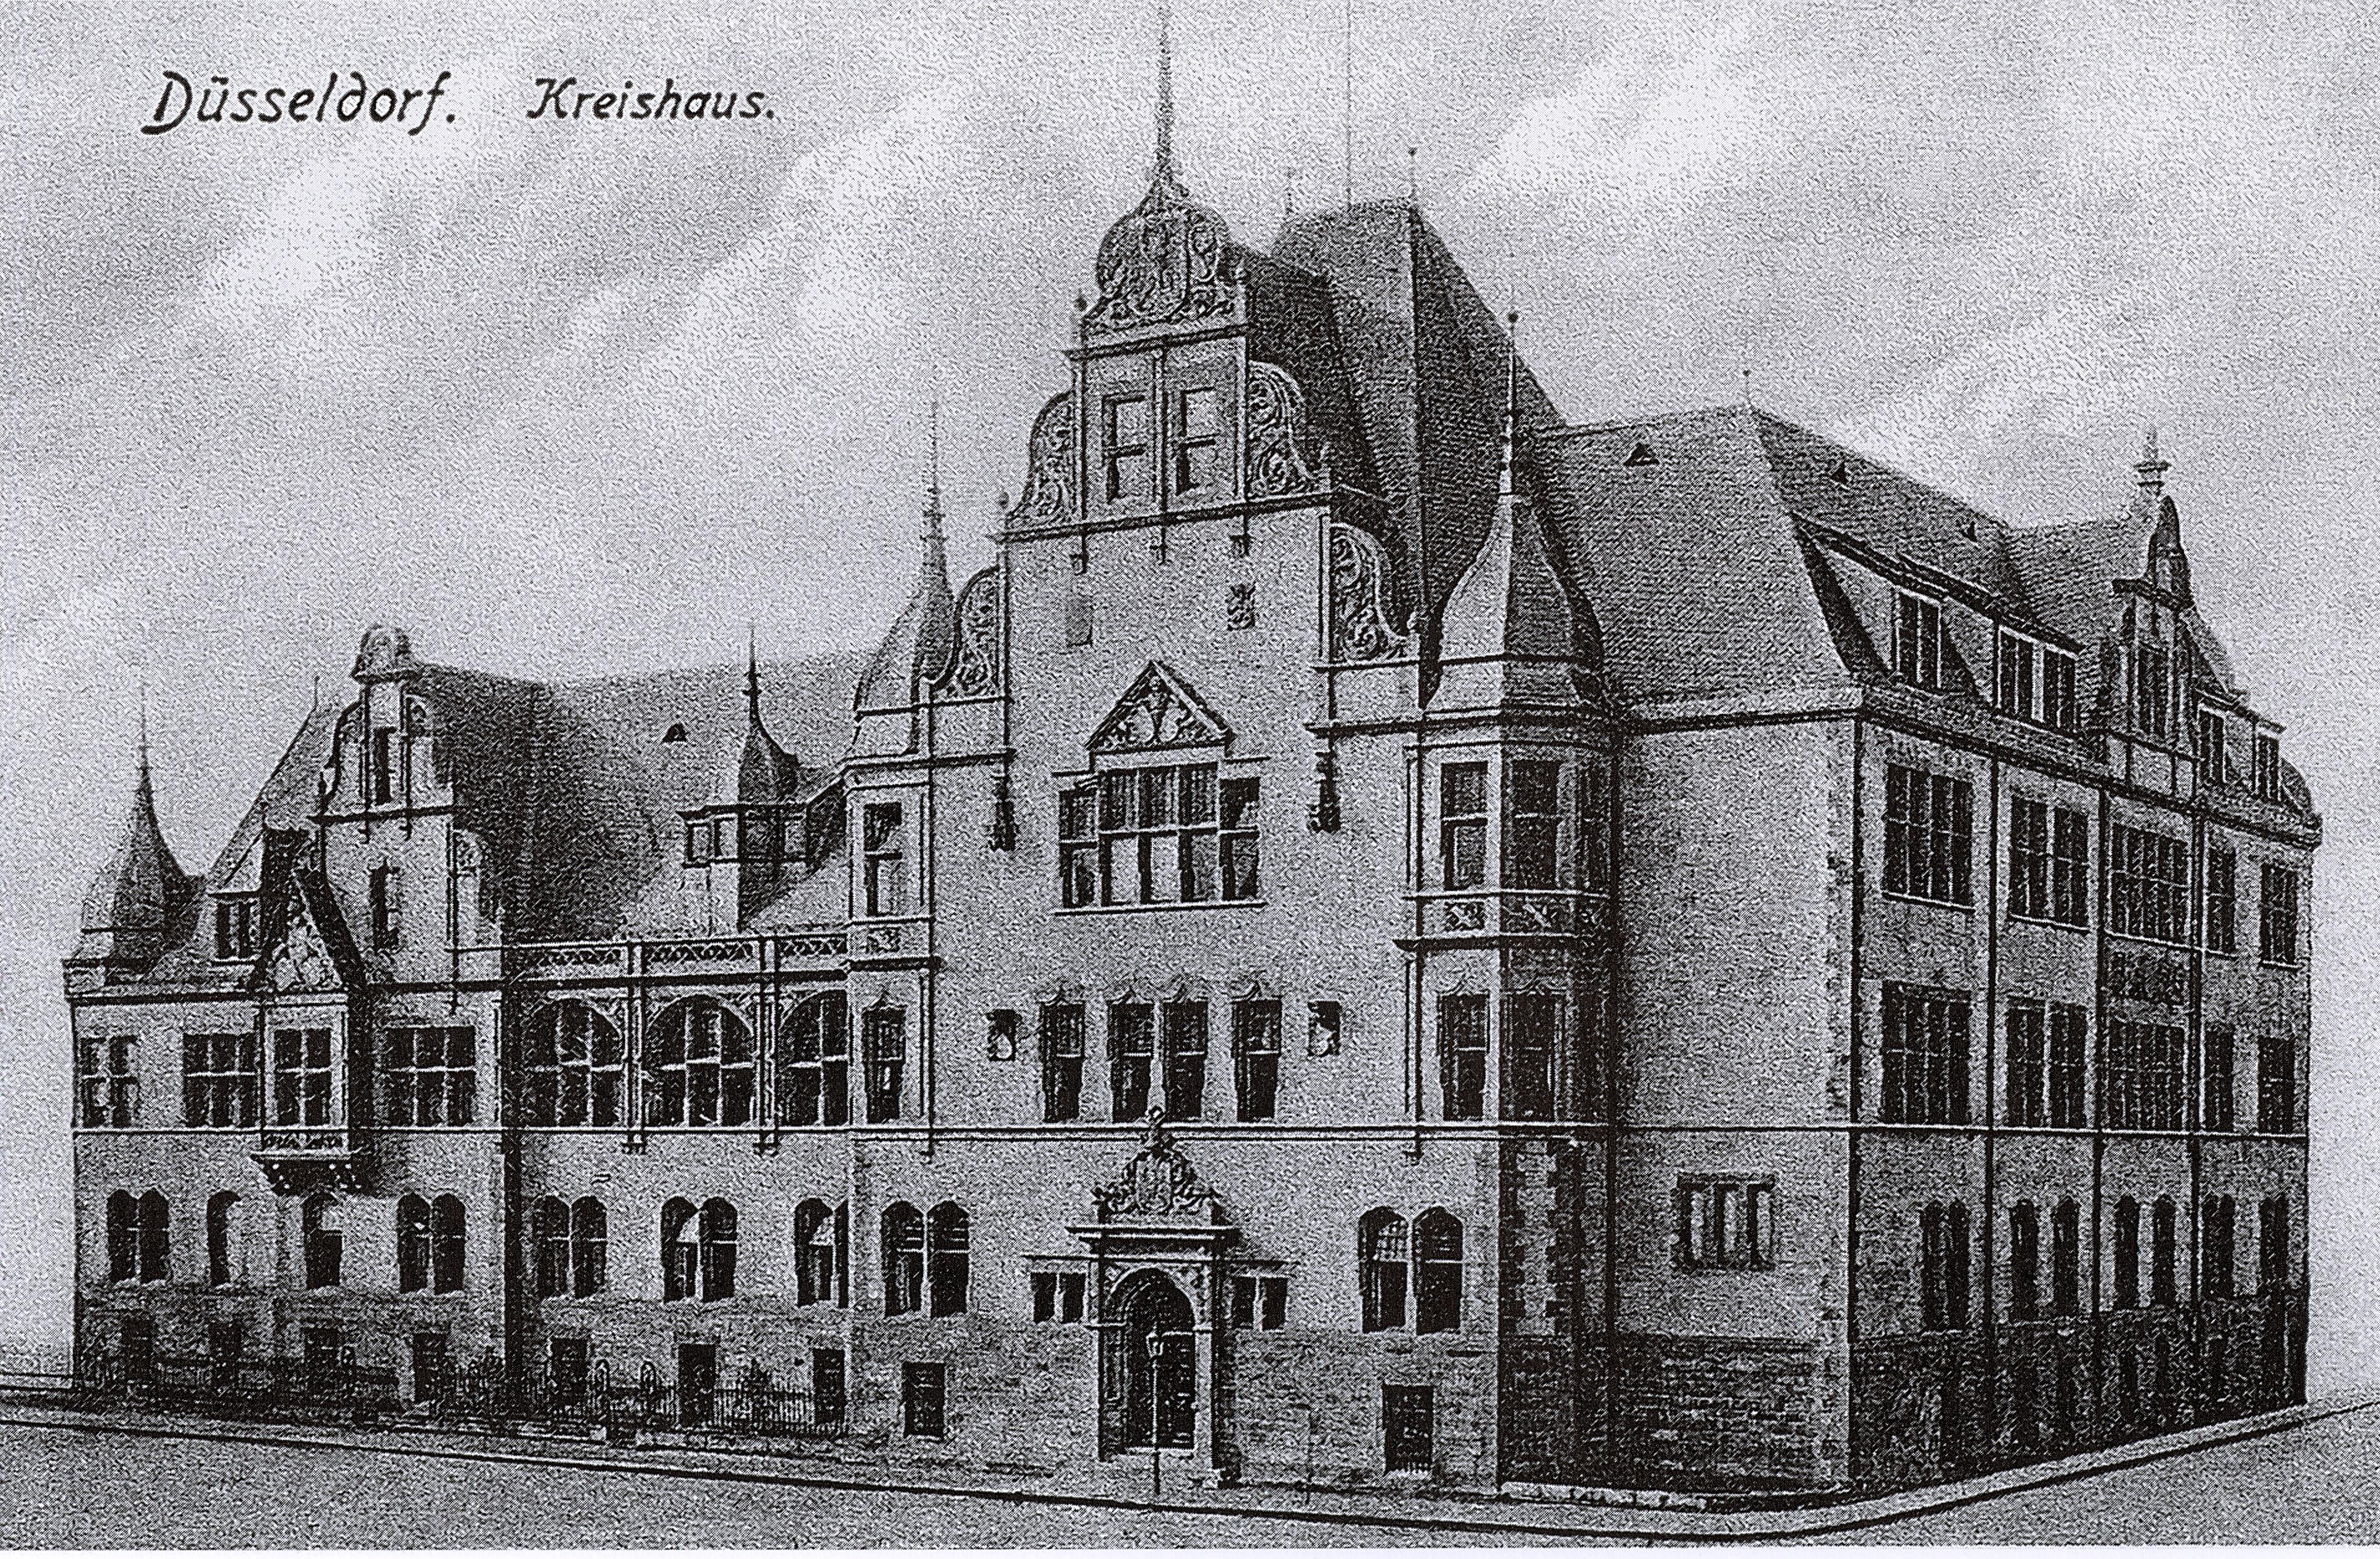 file d sseldorf kasernenstra e kreishaus erbaut 1901. Black Bedroom Furniture Sets. Home Design Ideas